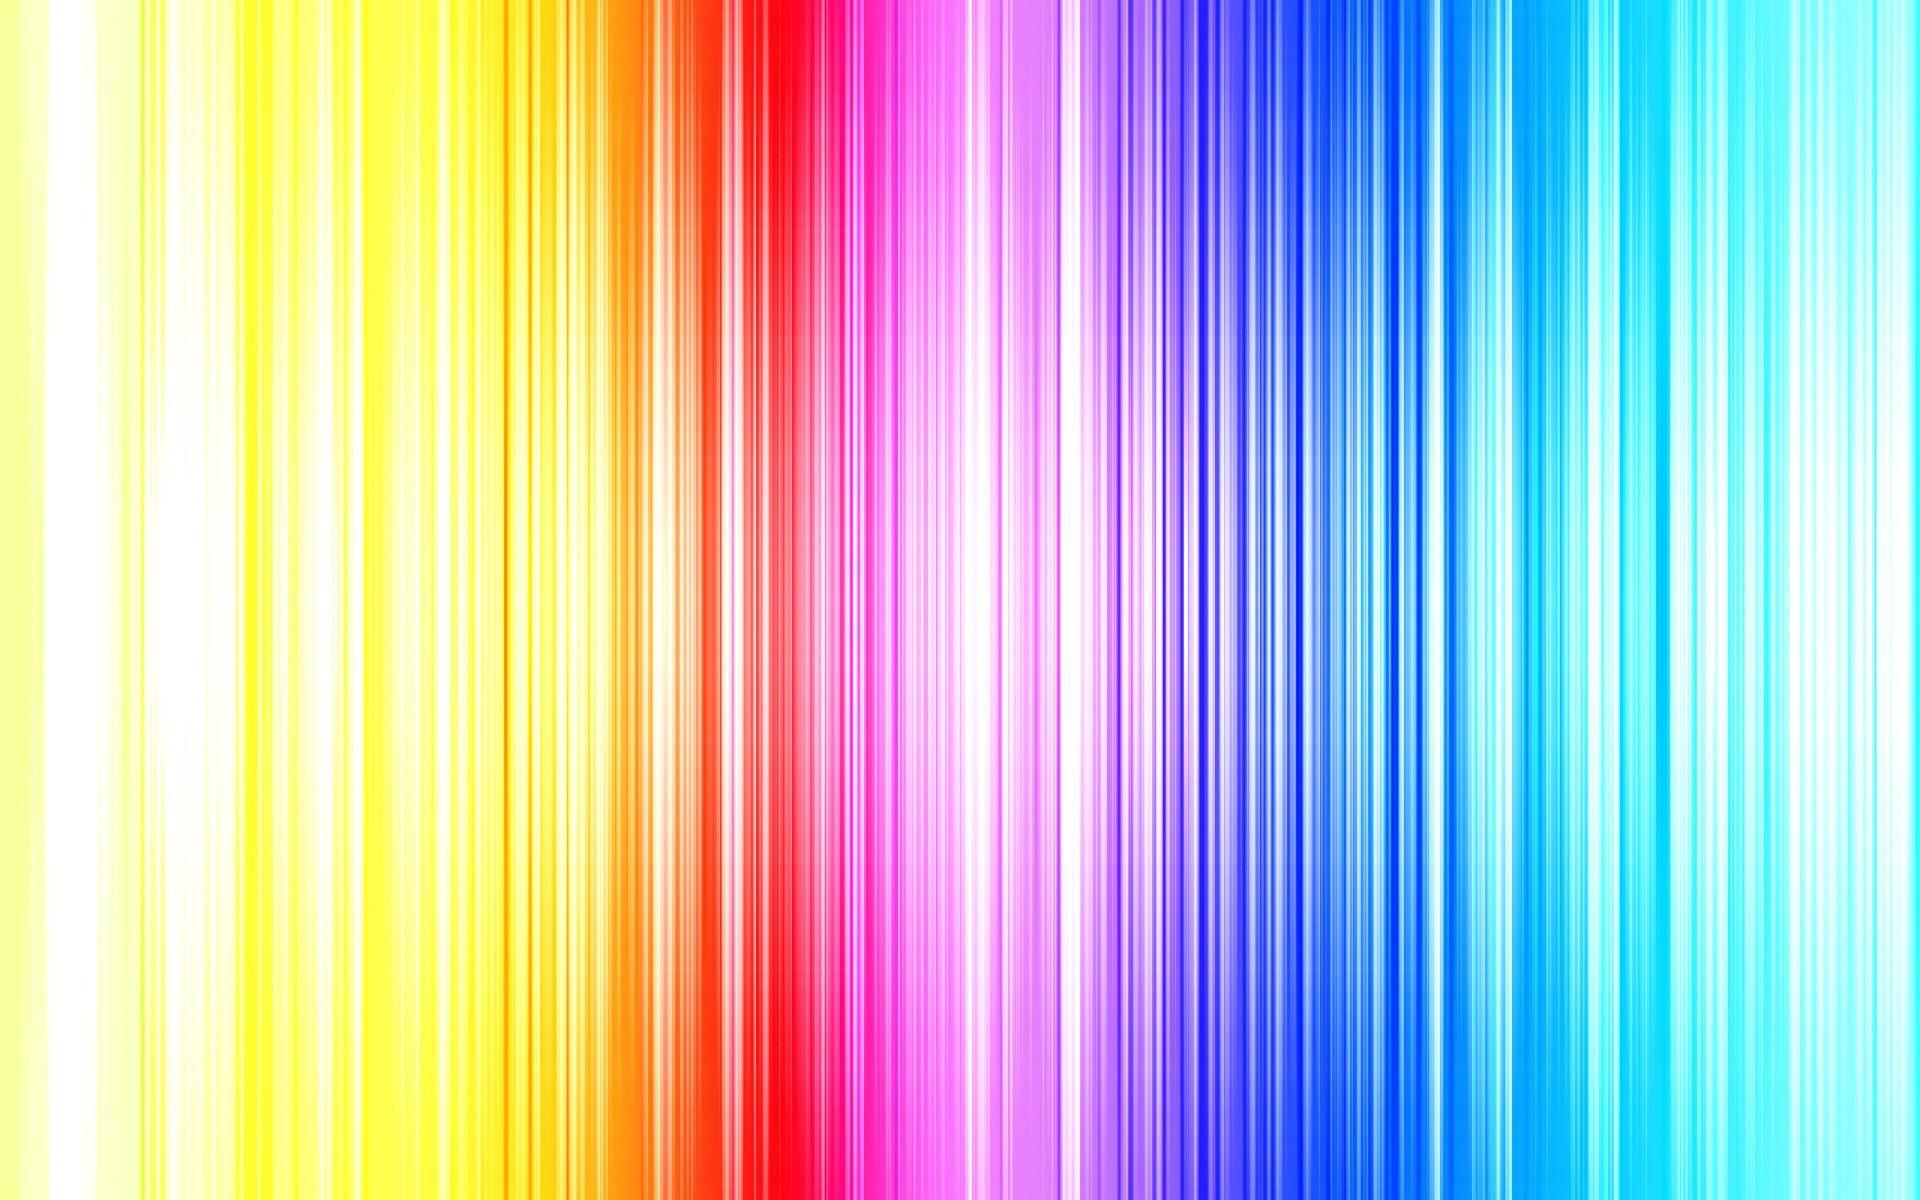 bright colorful hd wallpaper – DriverLayer Search Engine